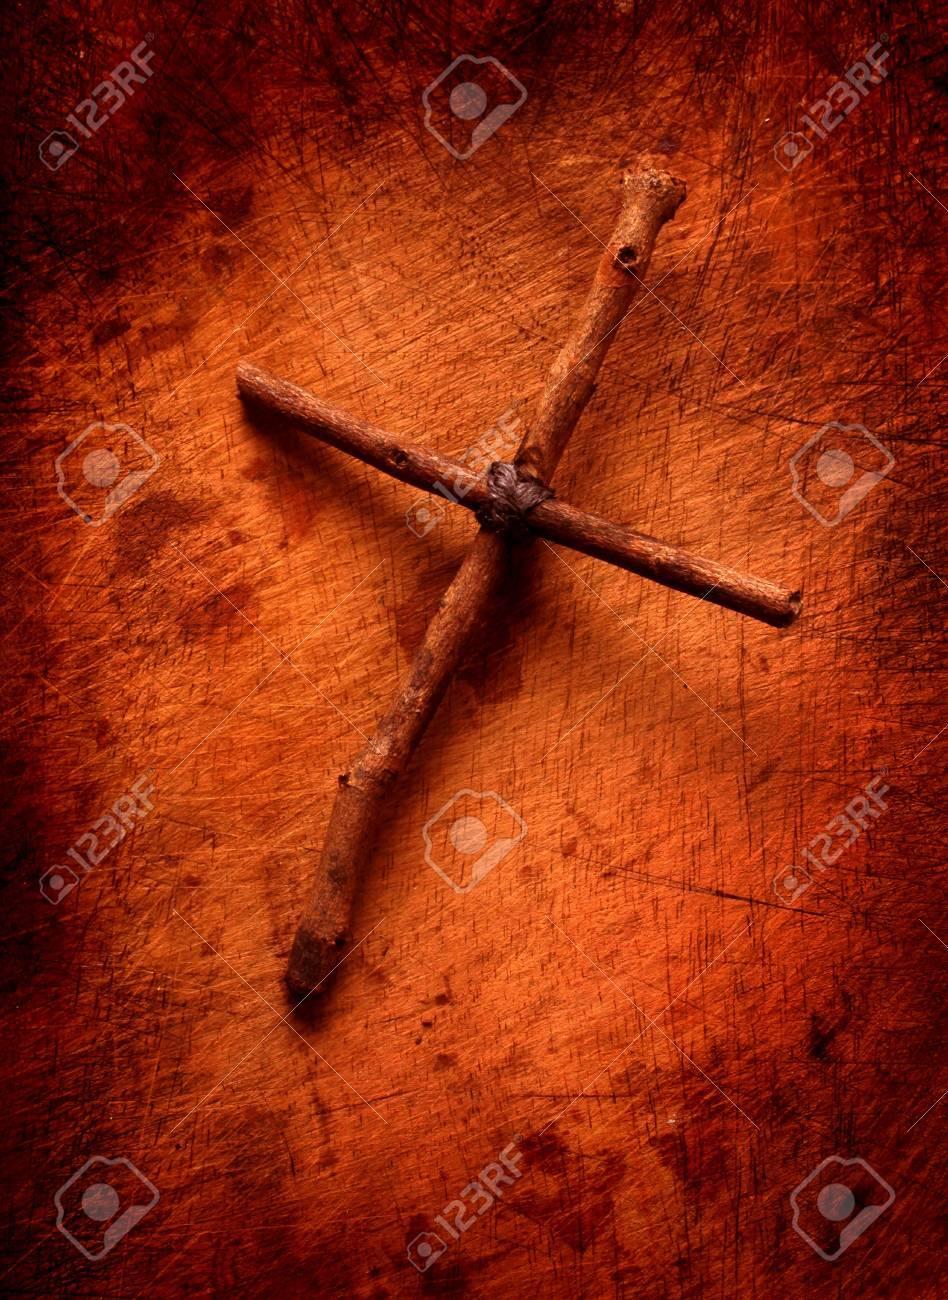 Close up of handmade paper Holy cross - 7041732